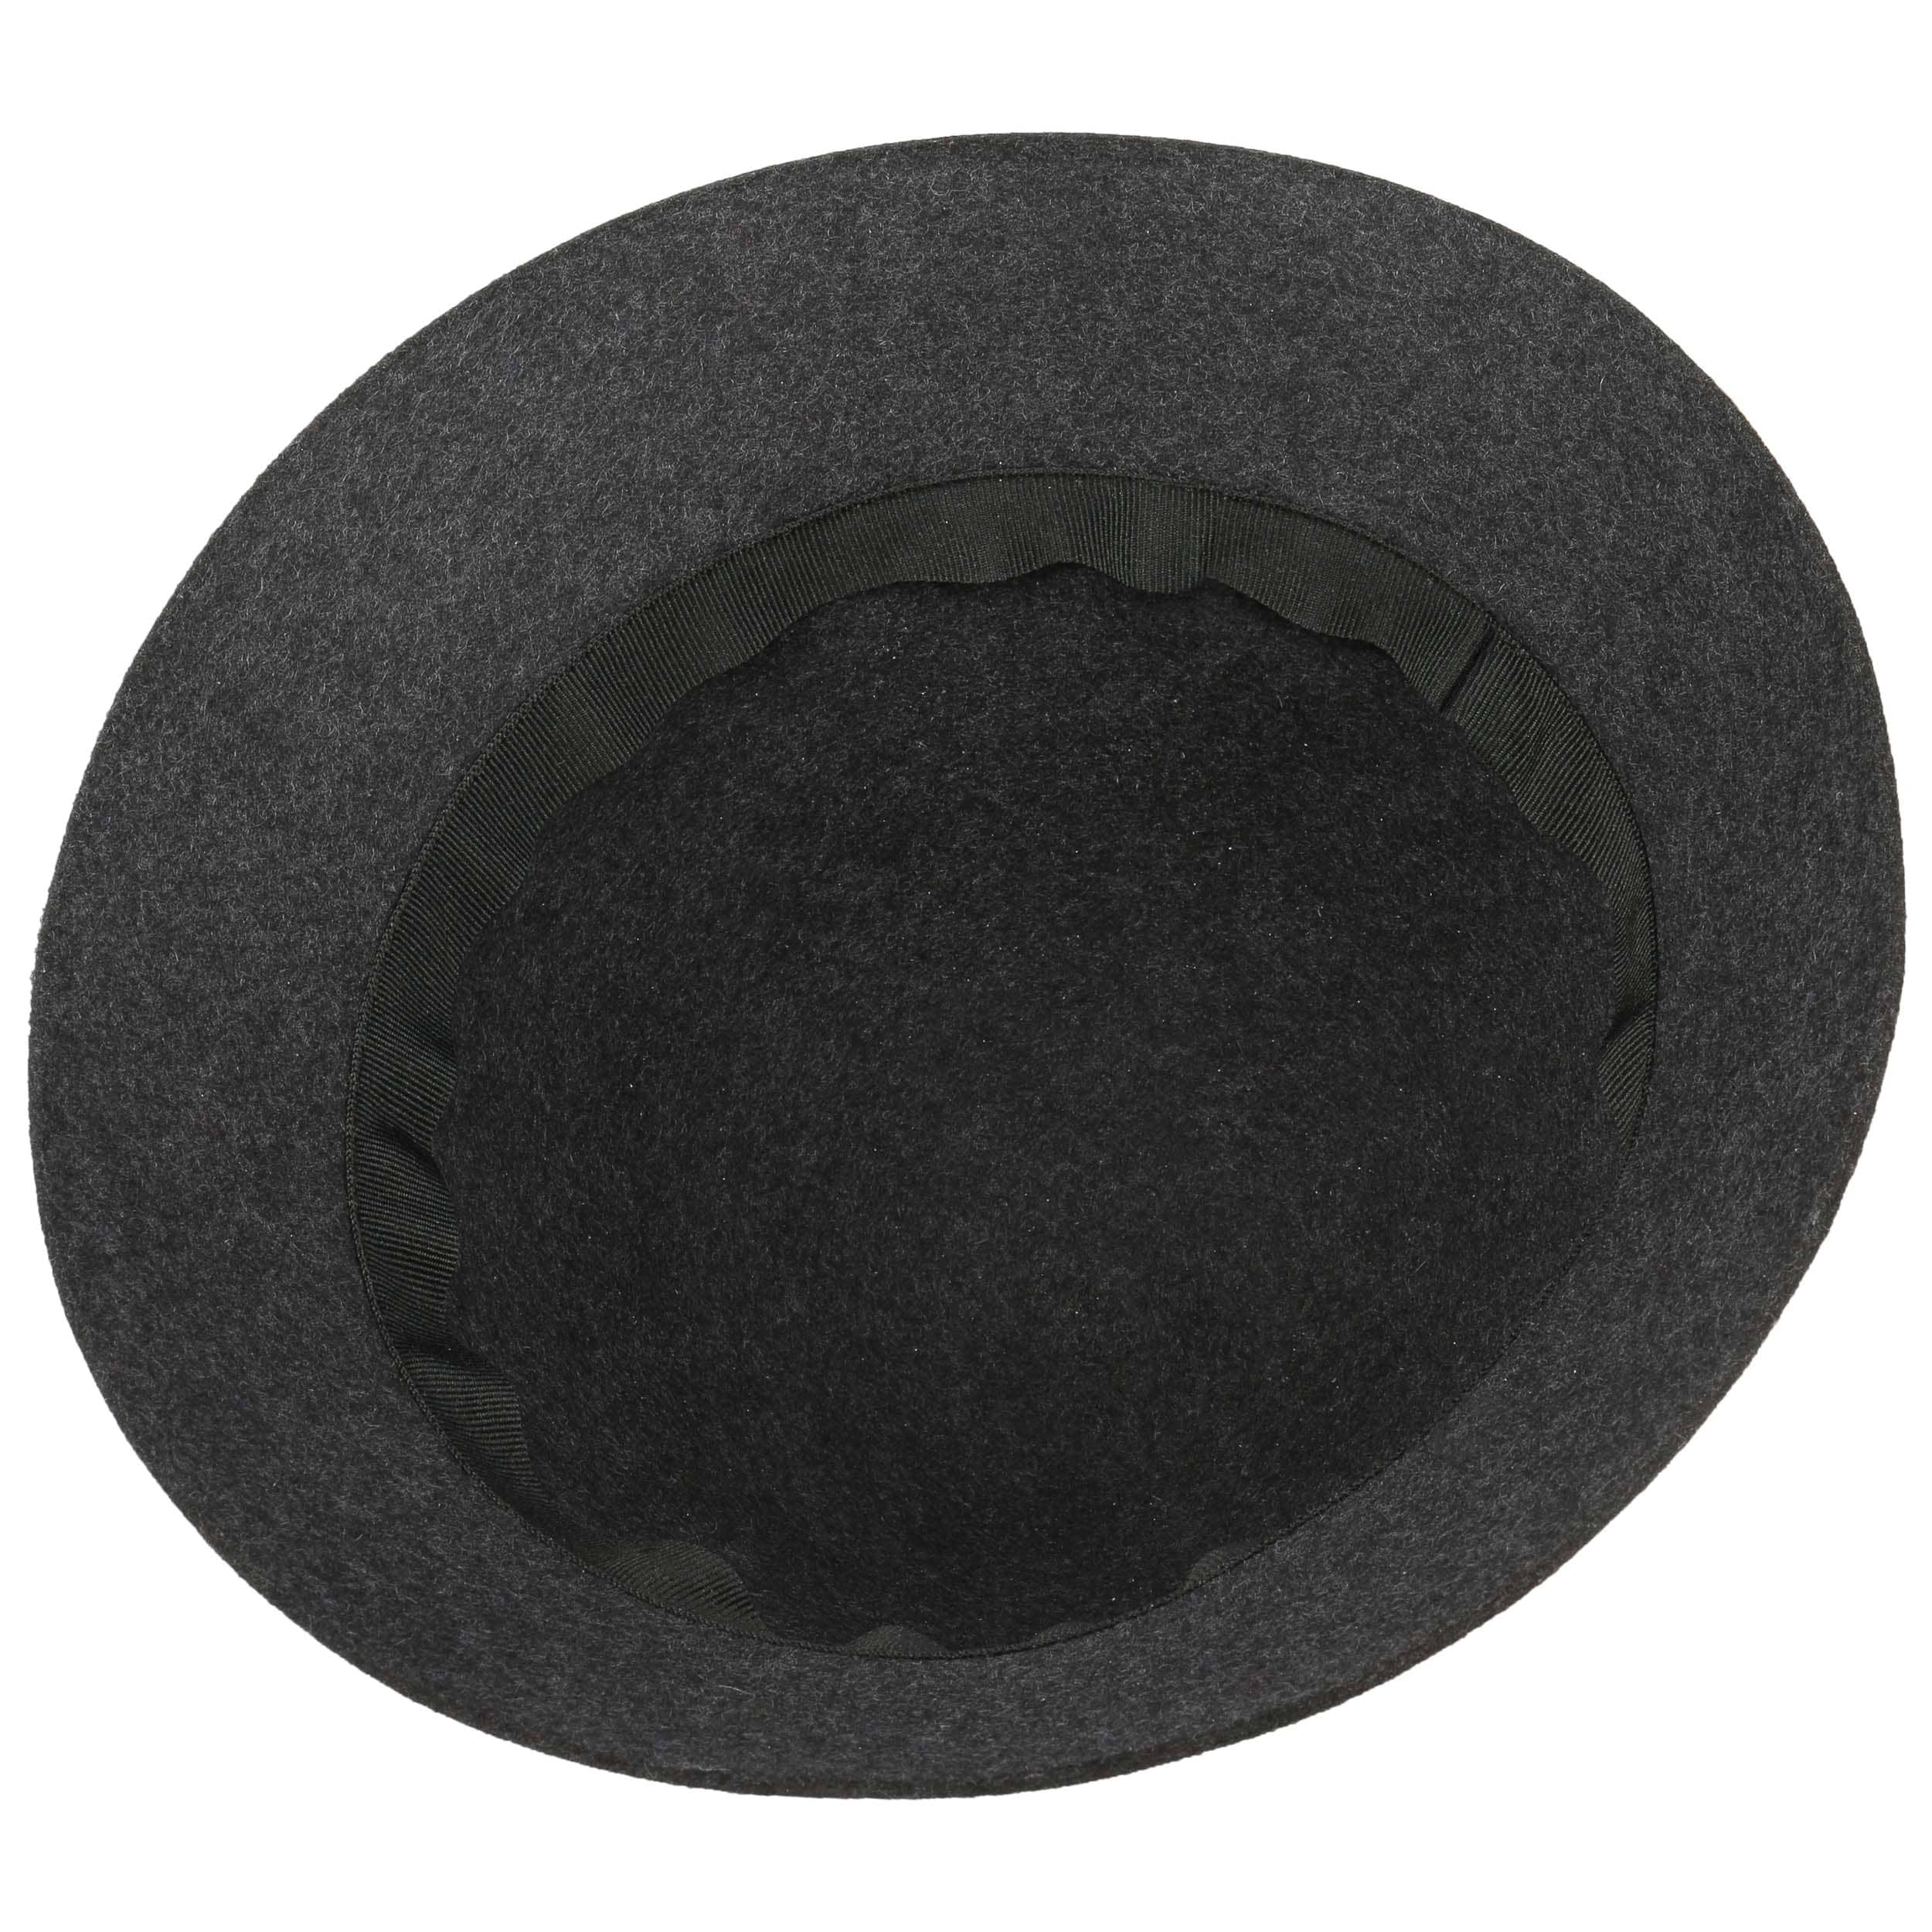 Schinderhannes Cappello Tradizionale - antracite 1 · Schinderhannes Cappello  Tradizionale - antracite 2 ... d290ef5fa5af